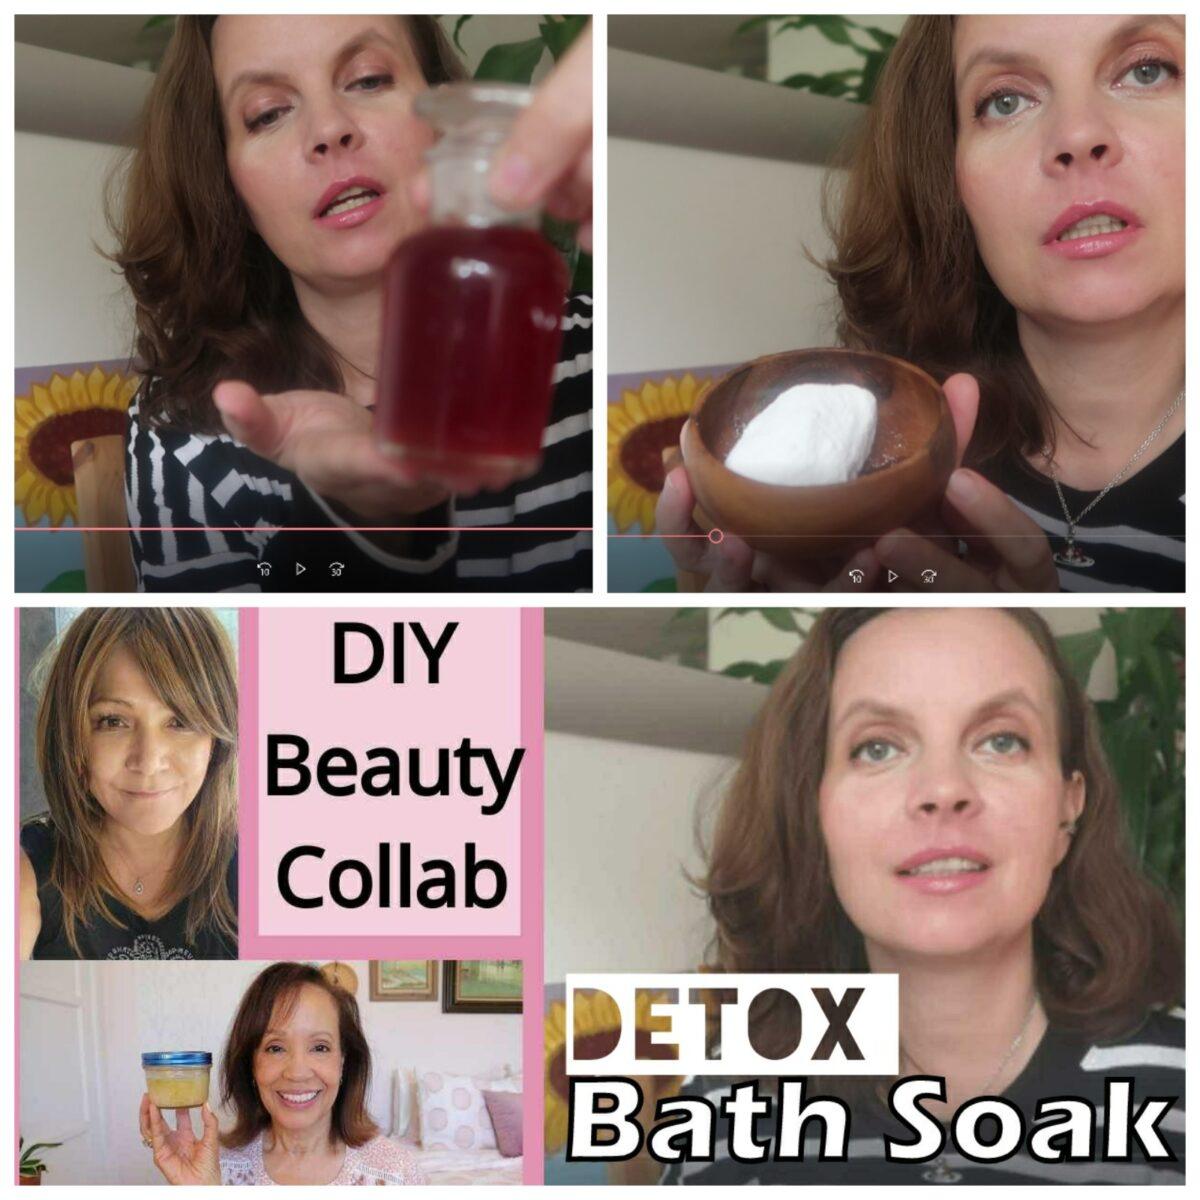 DIY Detox Bath Recipe – Youtube collaboration